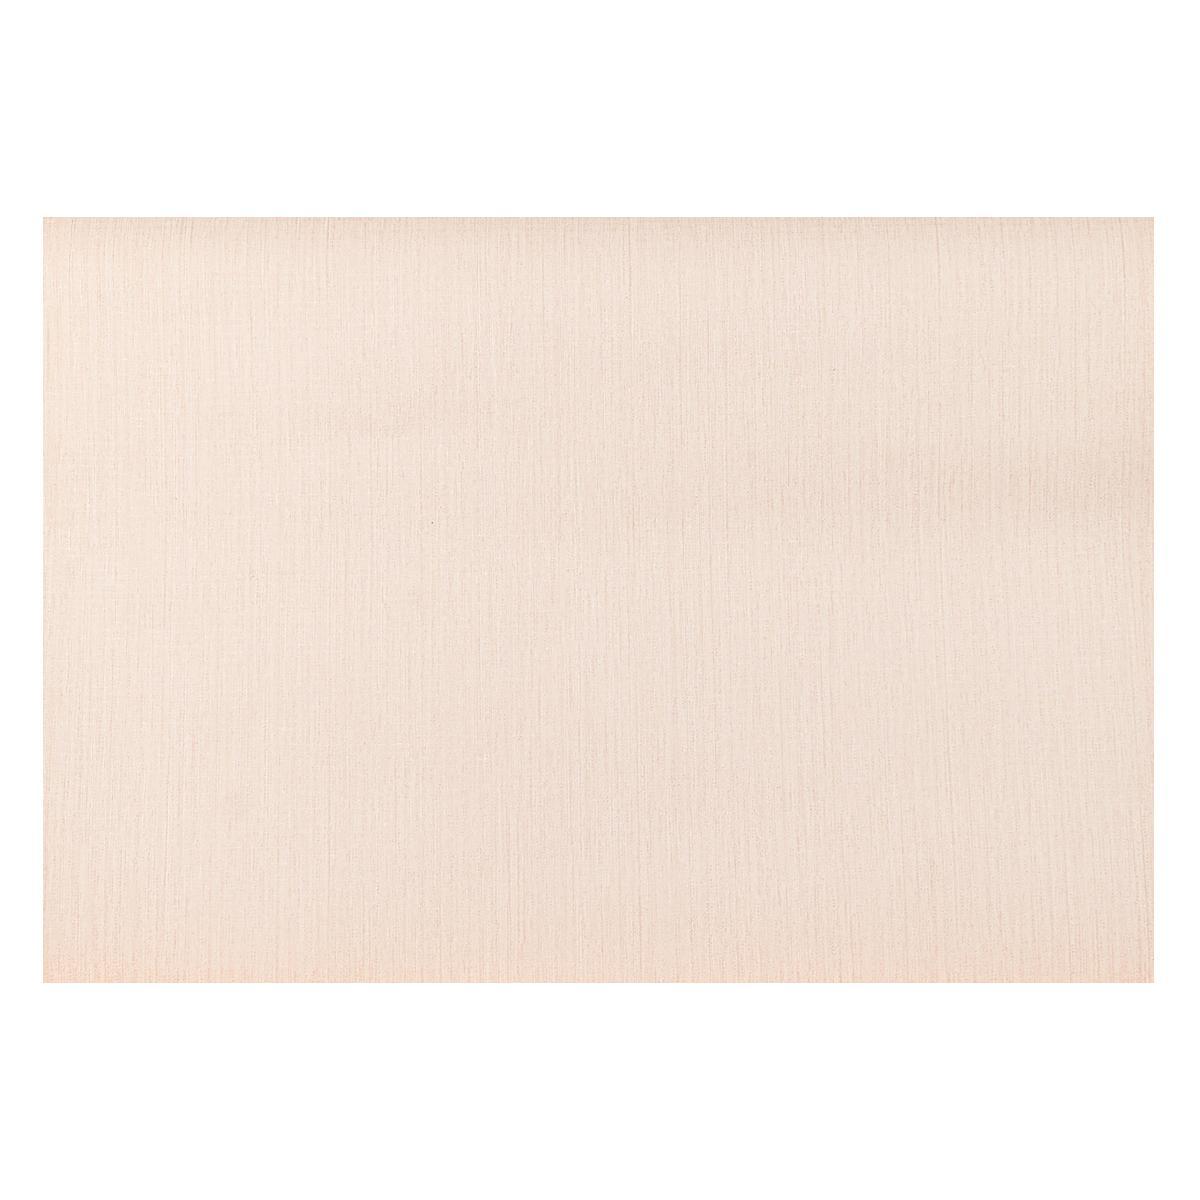 Papel Decorativo Icc Linear Rosado Mate - 53X1000 cm - 5.30 m2